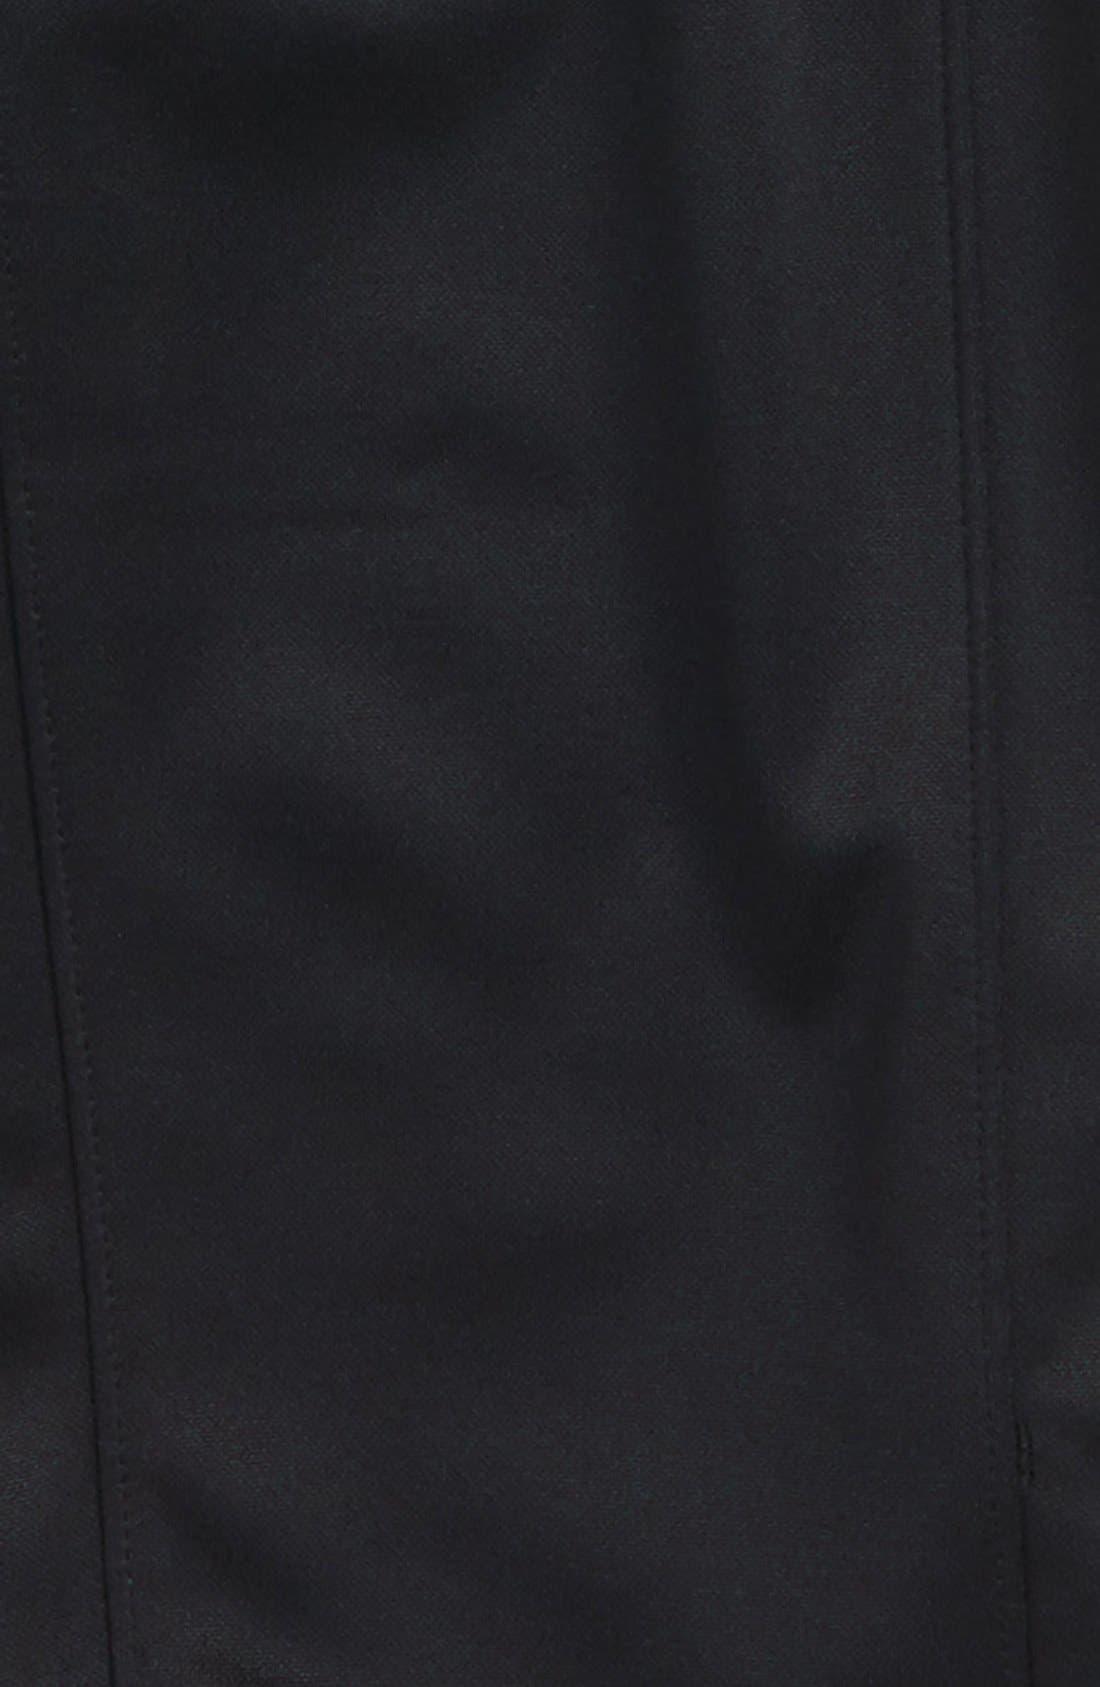 'Elite' Therma-FIT Pants,                             Alternate thumbnail 2, color,                             010